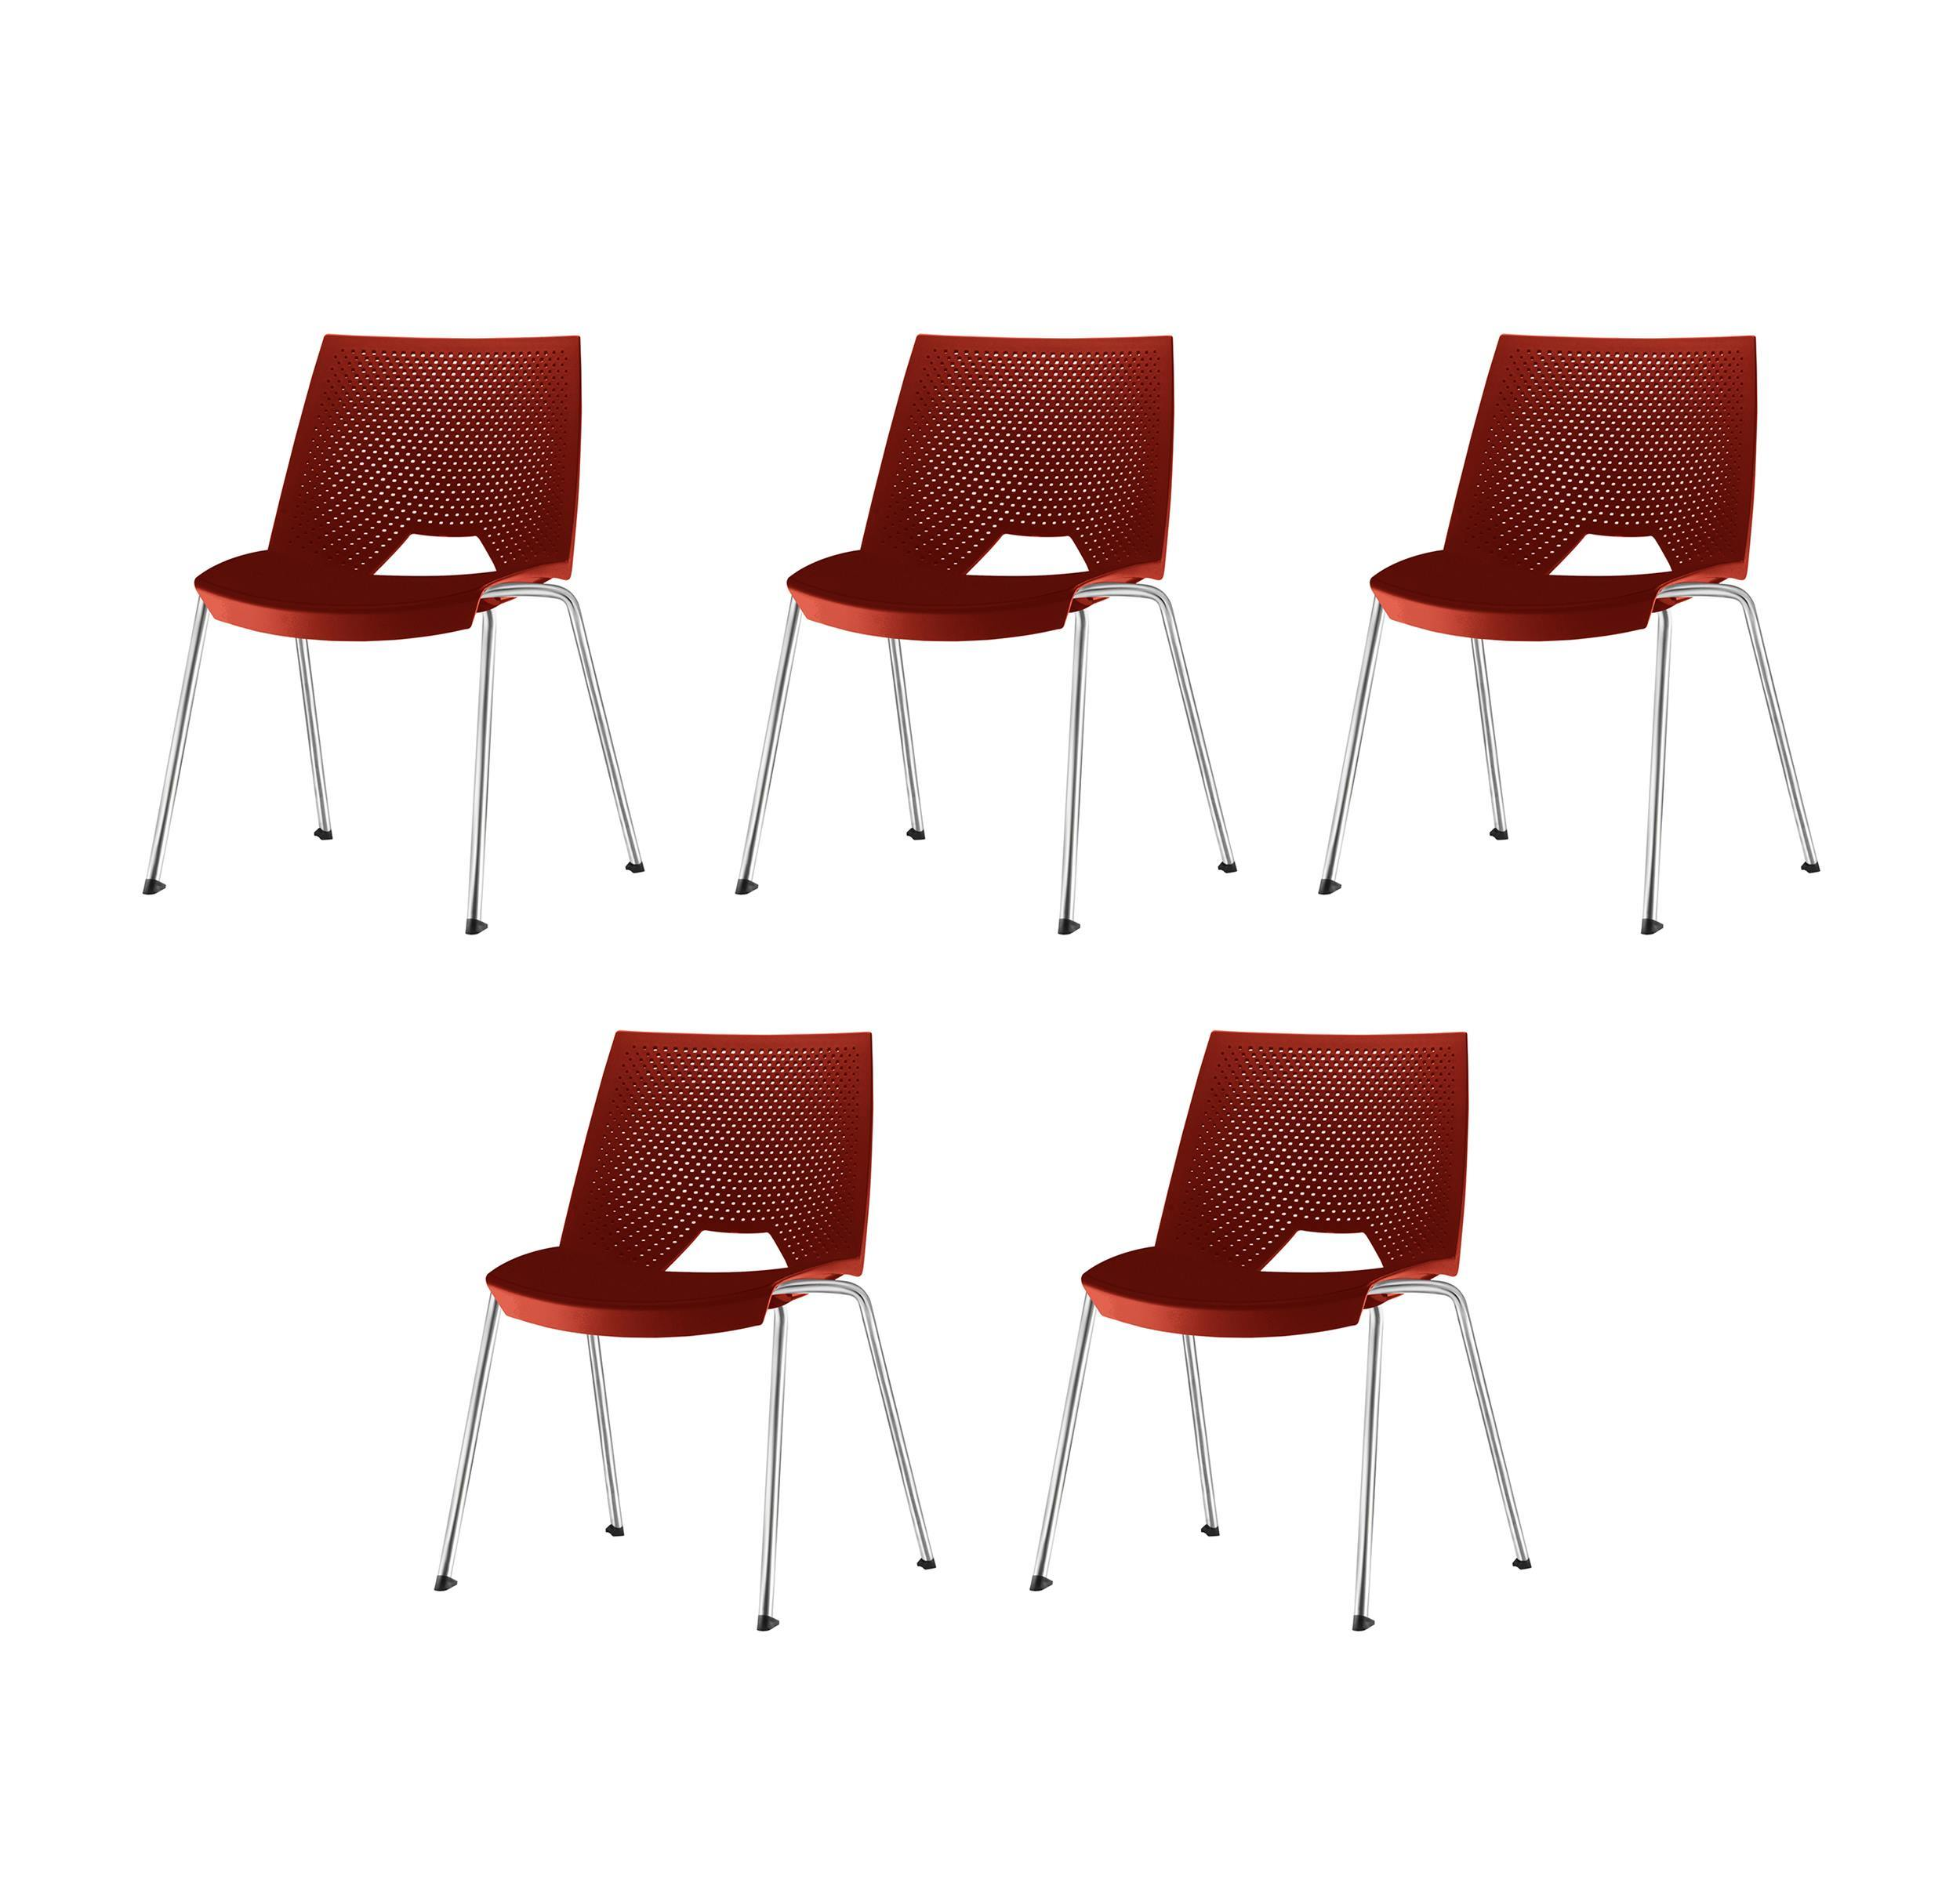 Kit 5 Cadeiras Strike Assento Vermelho Base Cromada - 57685